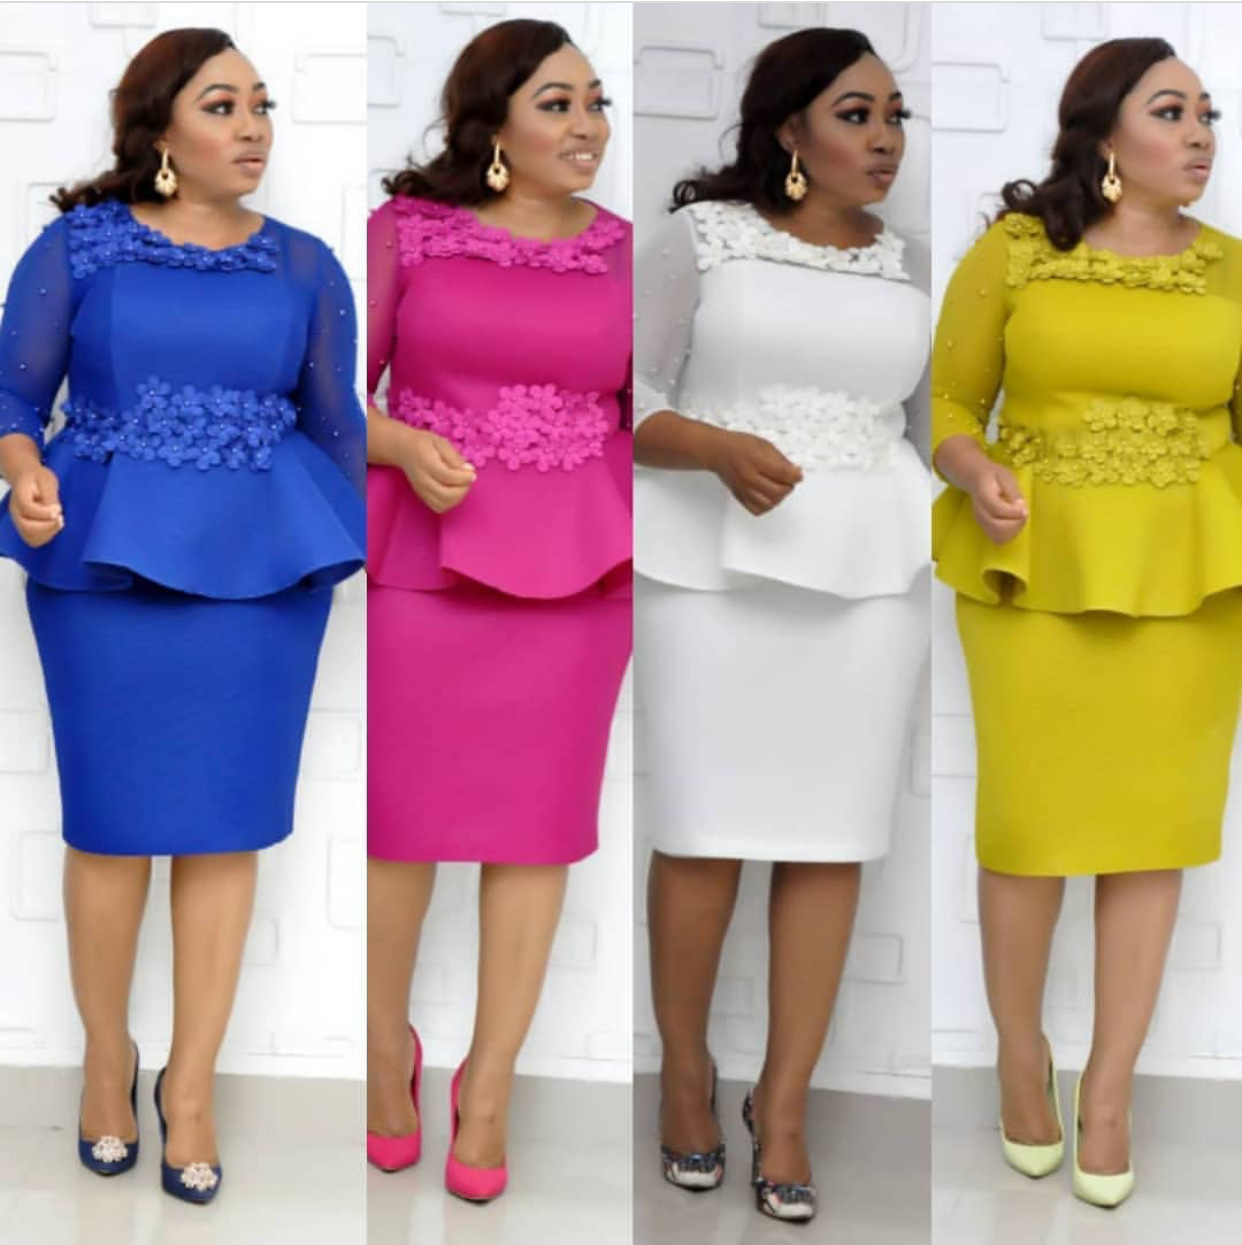 2019 New Fashion Style Autumn African Women Beauty Plus Size Knee-length Dress L-3XL